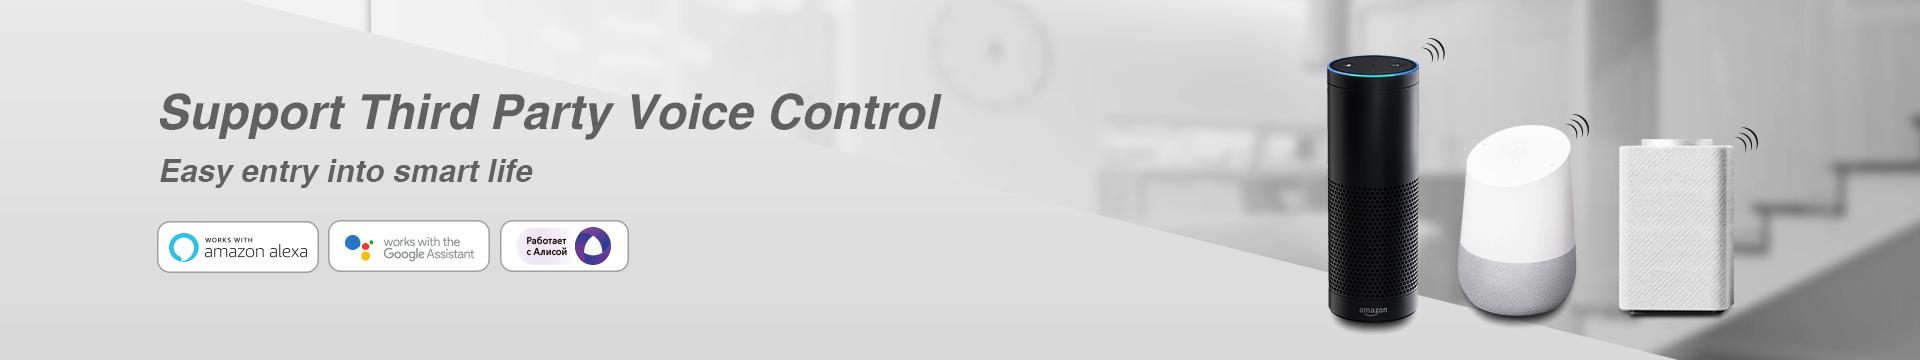 Mi-Light Wi-Fi control system works with Tuya Smart app and Alexa Voice control